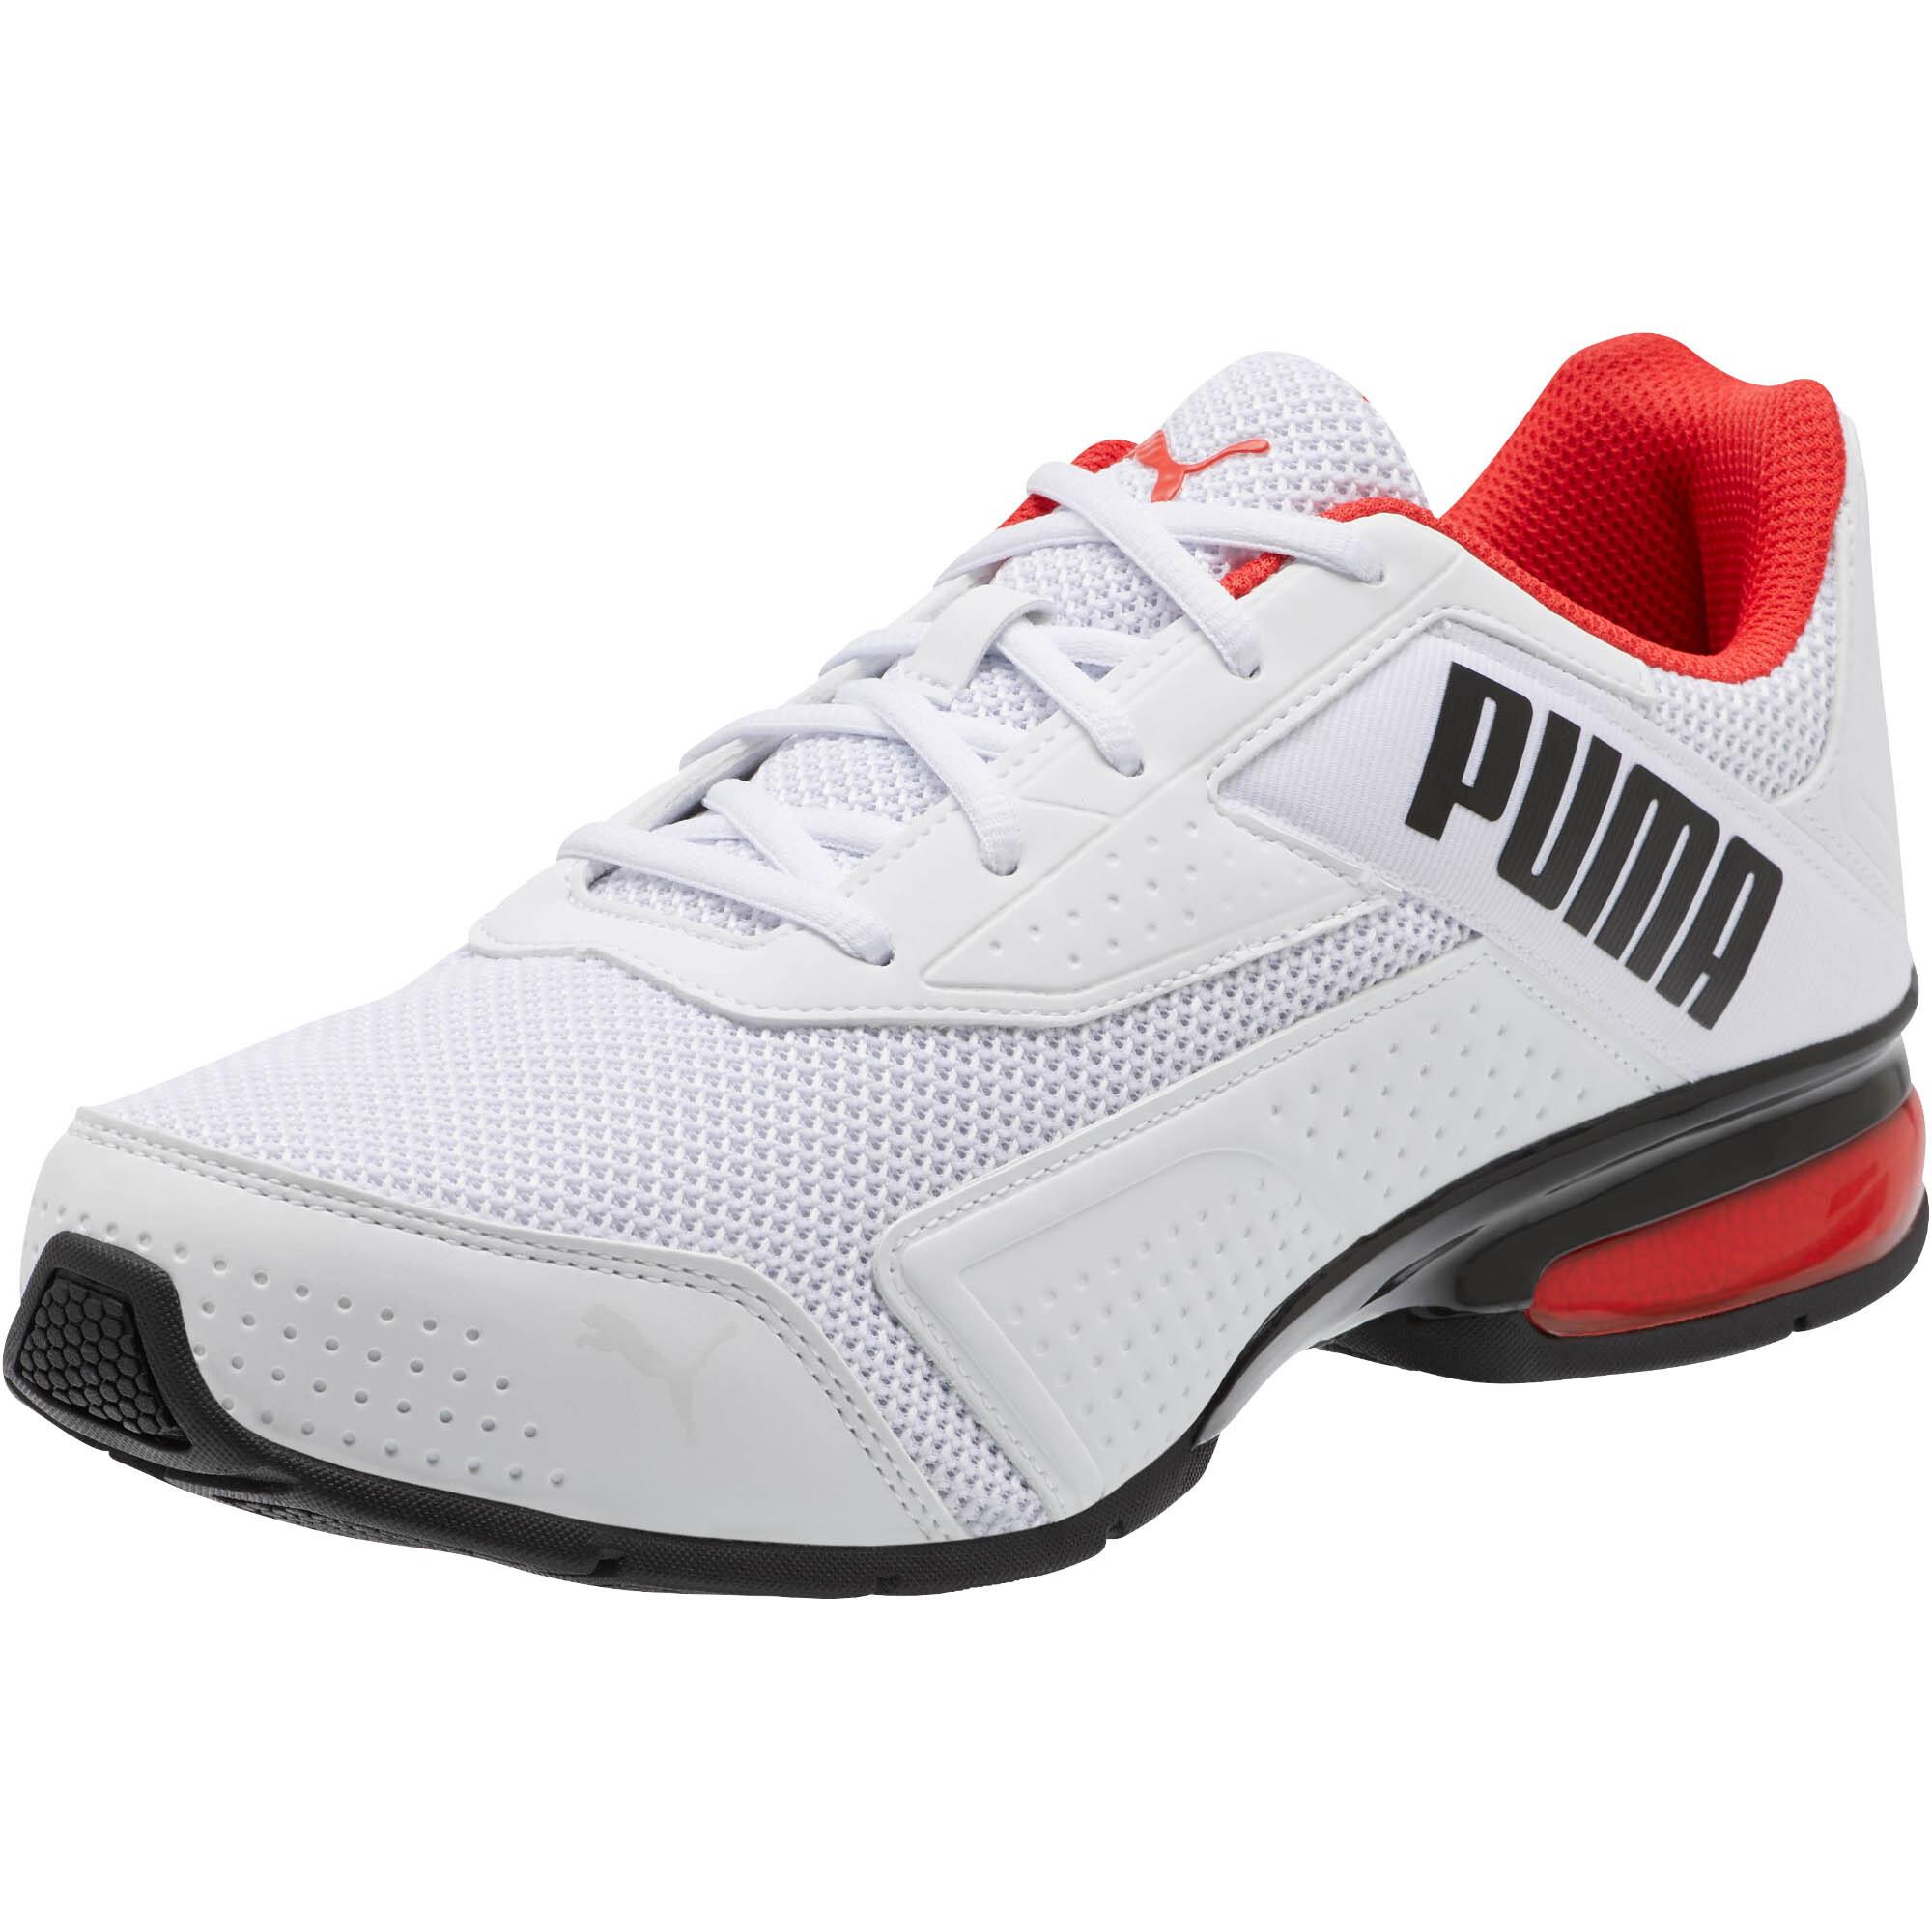 PUMA-Leader-VT-Bold-Men-039-s-Training-Shoes-Men-Shoe-Running thumbnail 4